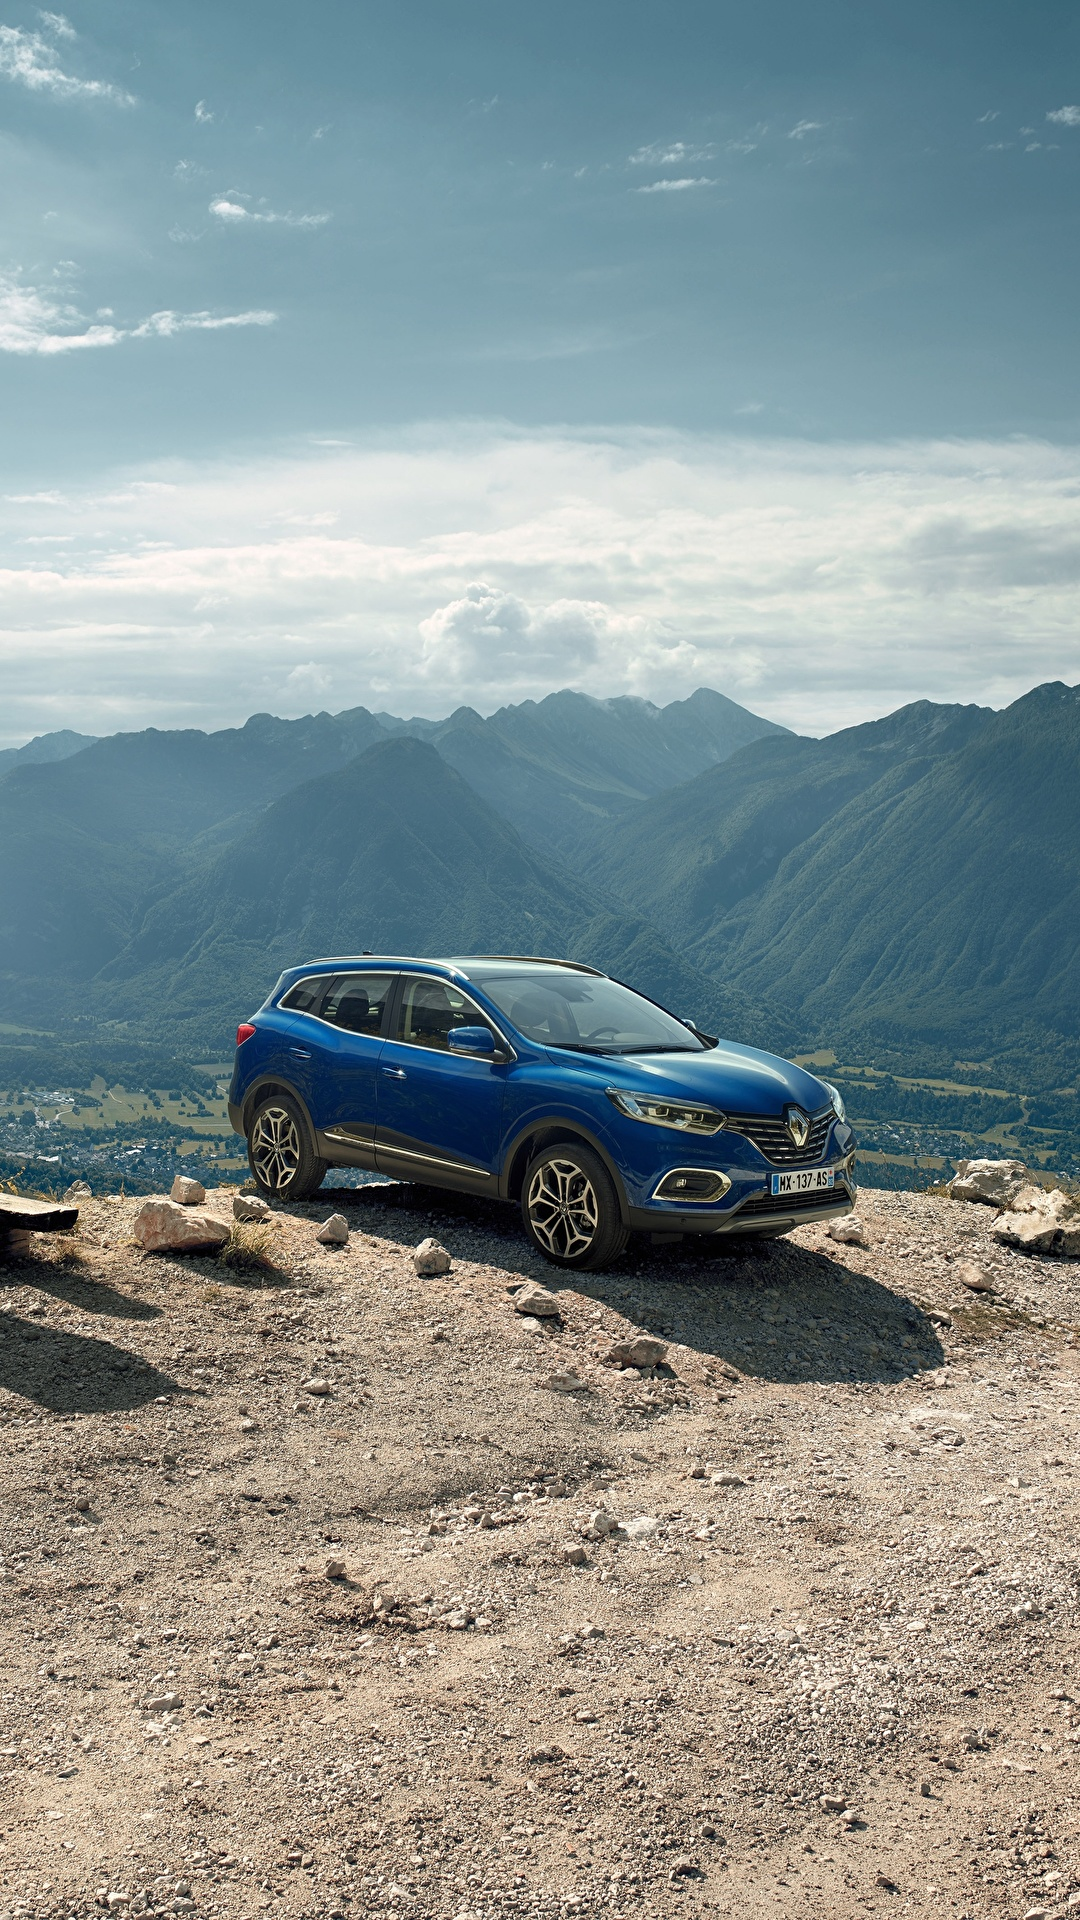 Картинка Рено 2018 Kadjar Worldwide Синий Автомобили 1080x1920 Renault Авто Машины